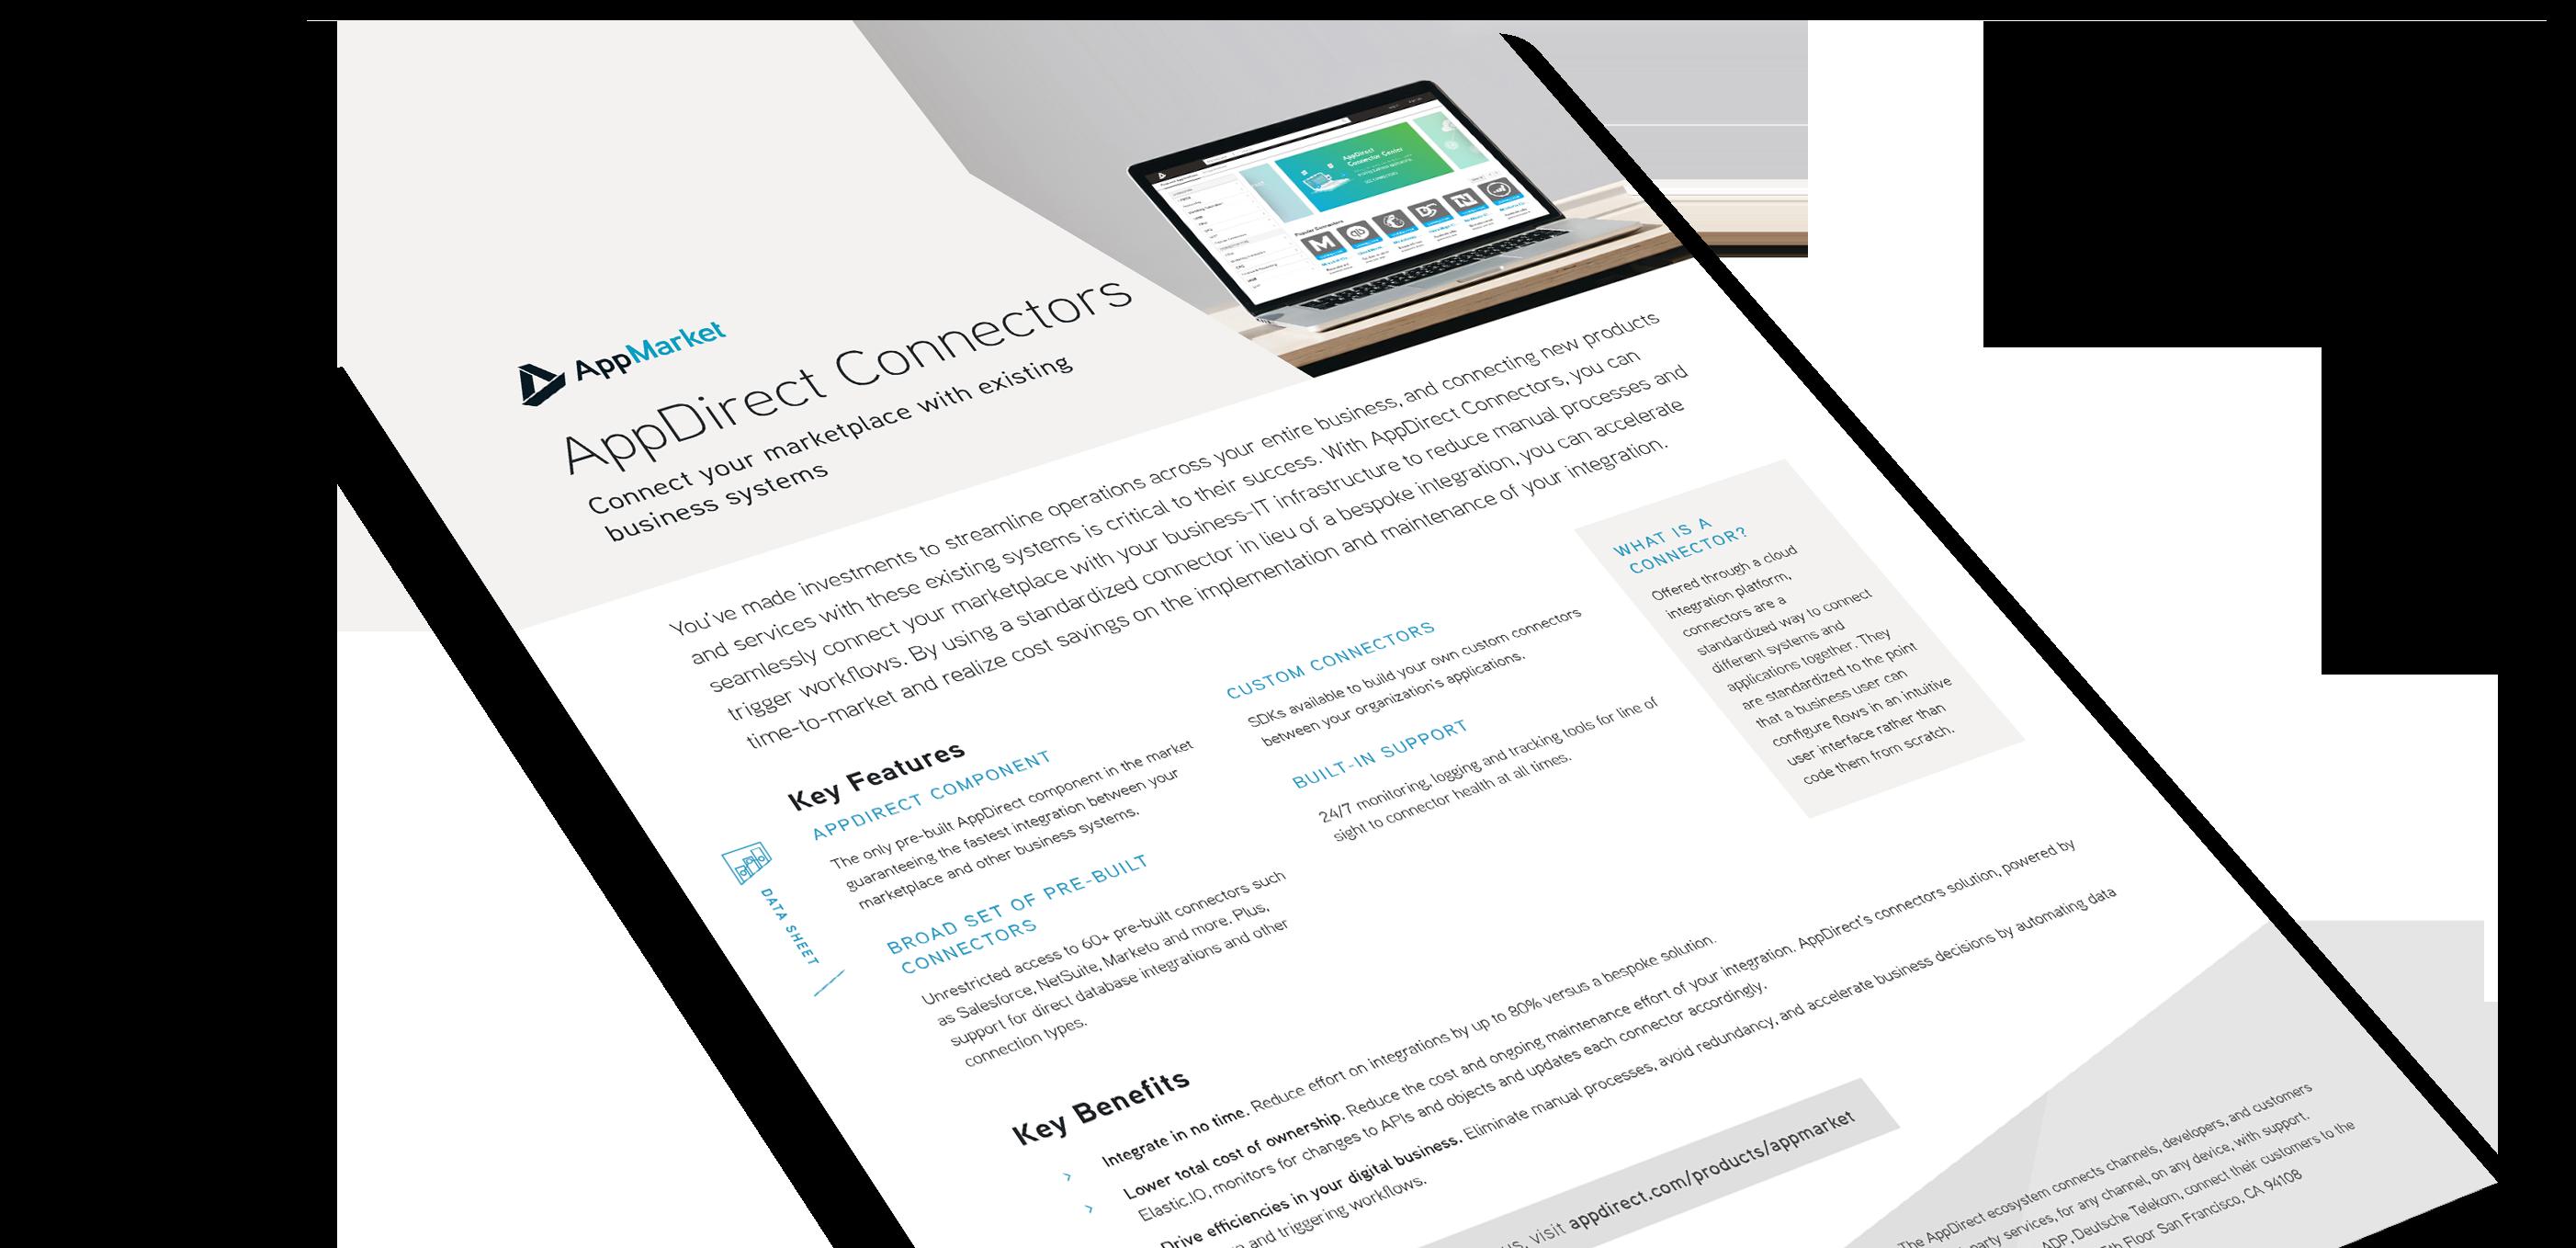 Snapshot: AppDirect Connectors